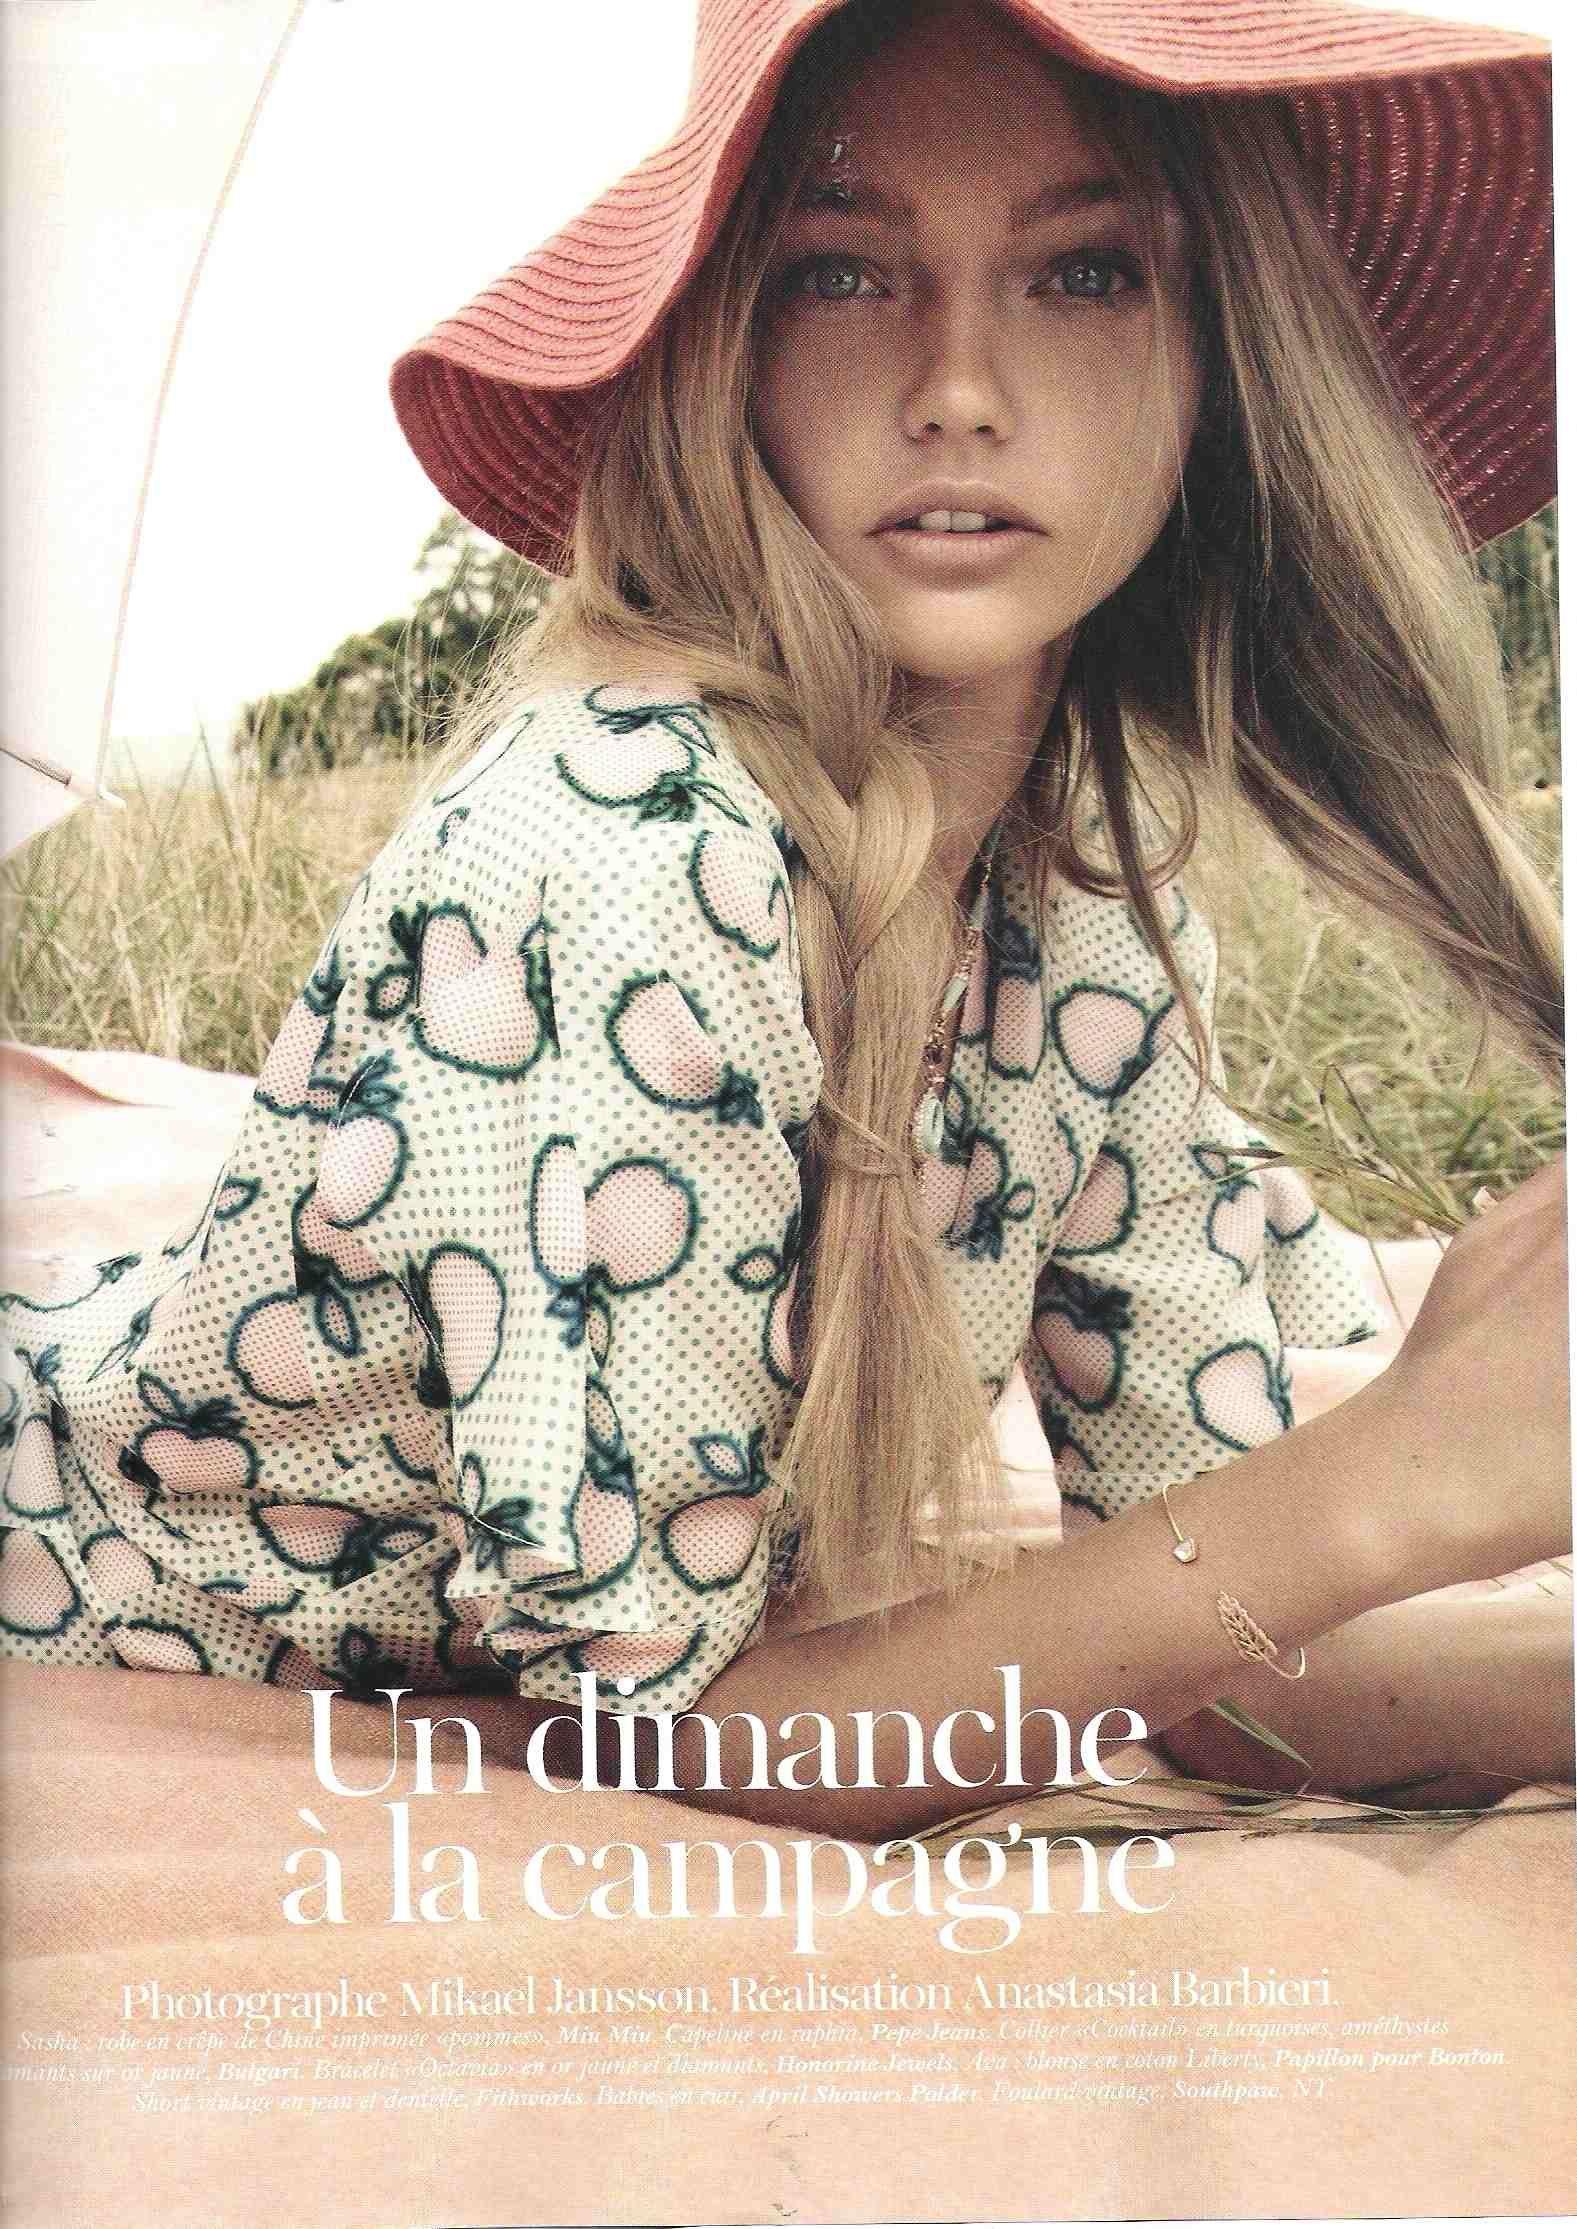 #lolita #editorial #fashion #photoshoot